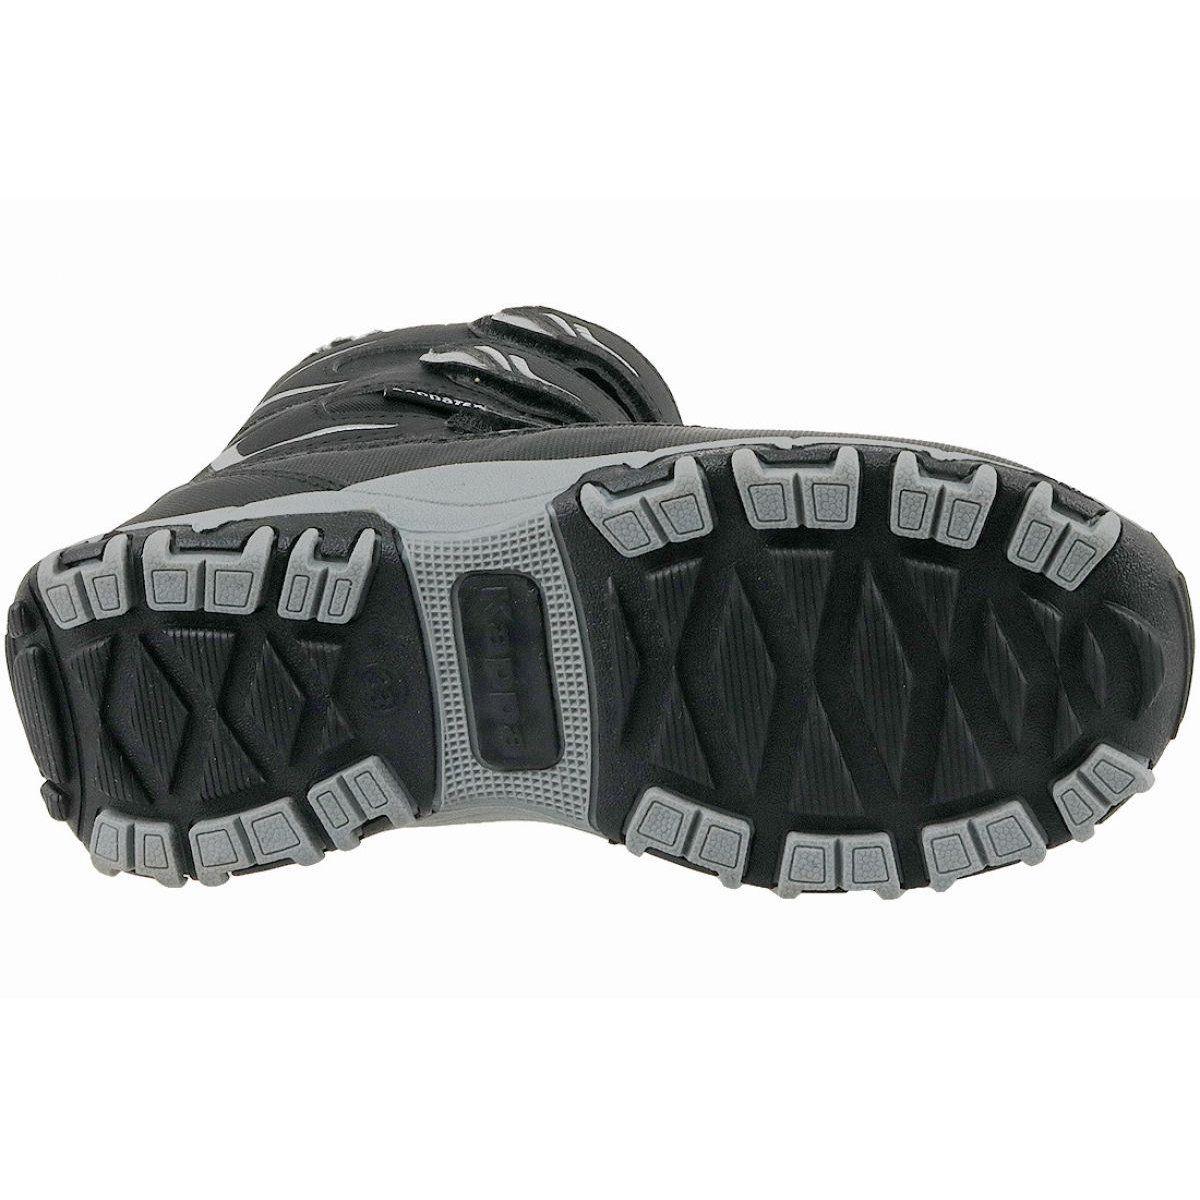 Buty Sportowe Dzieciece Dla Dzieci Innamarka Buty Zimowe Kappa Great Tex Jr 260558k 1115 Czarne Winter Boots Warm Winter Boots Kid Shoes